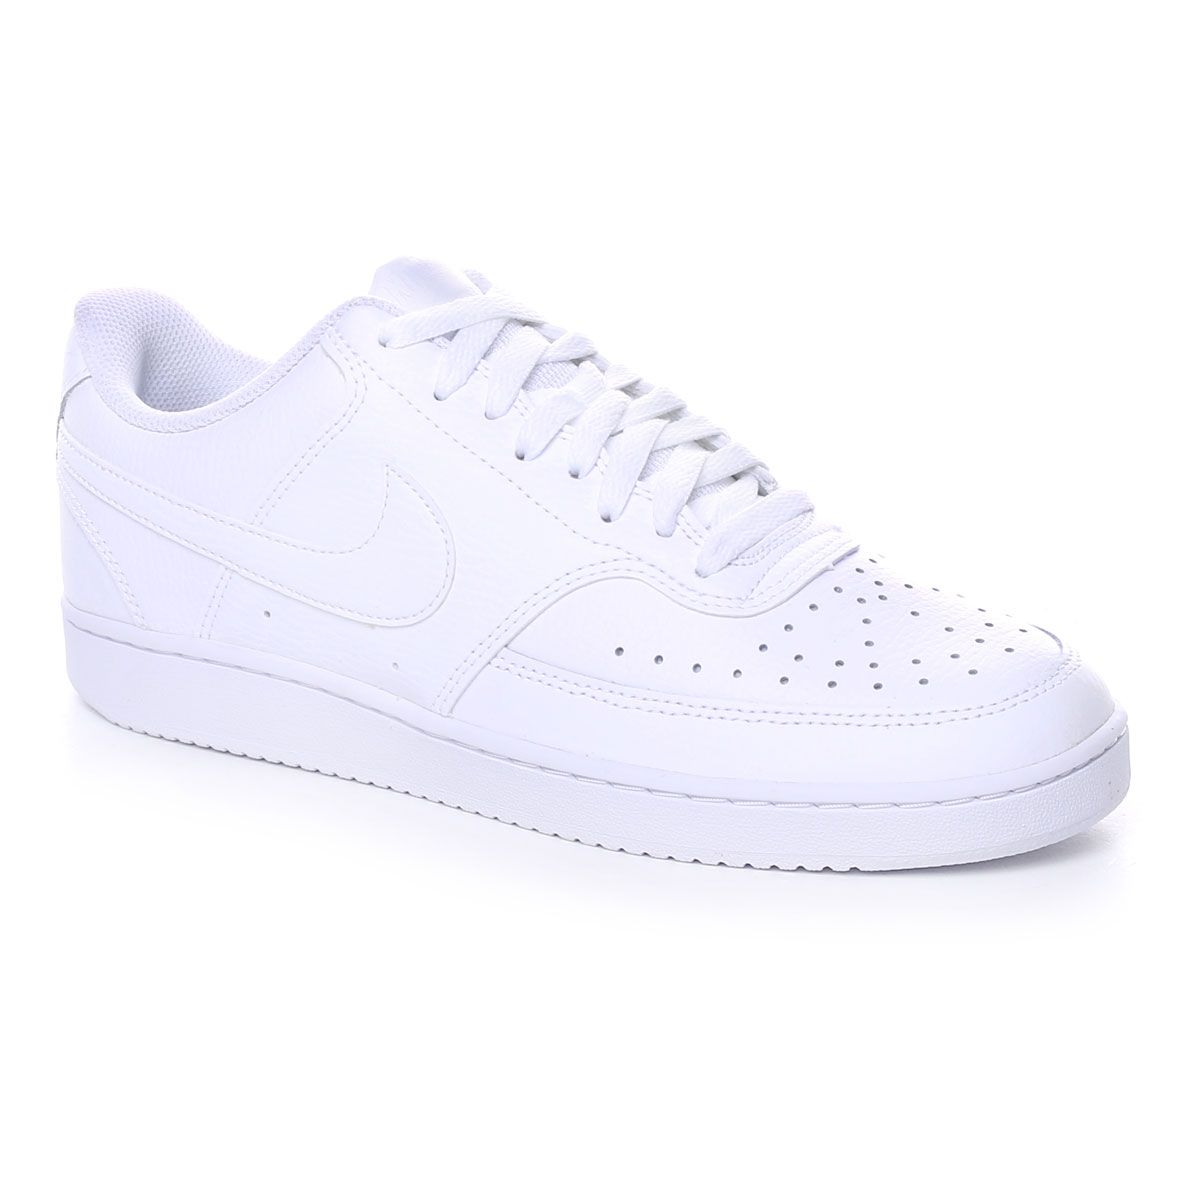 Nike Court Vision Low Uomo White